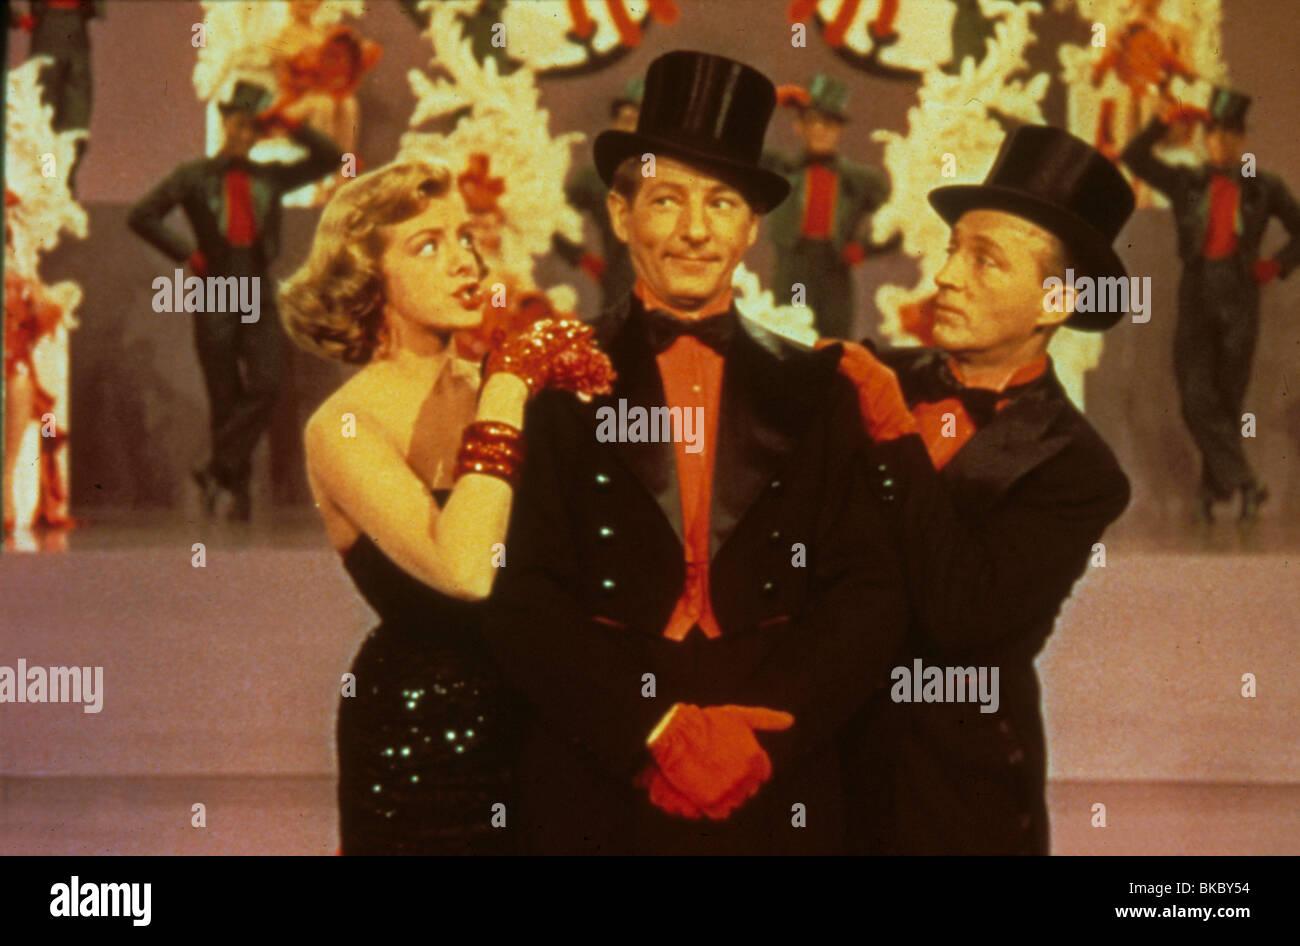 White Christmas 1954 Rosemary Clooney Danny Kaye Bing Crosby Whc1 006